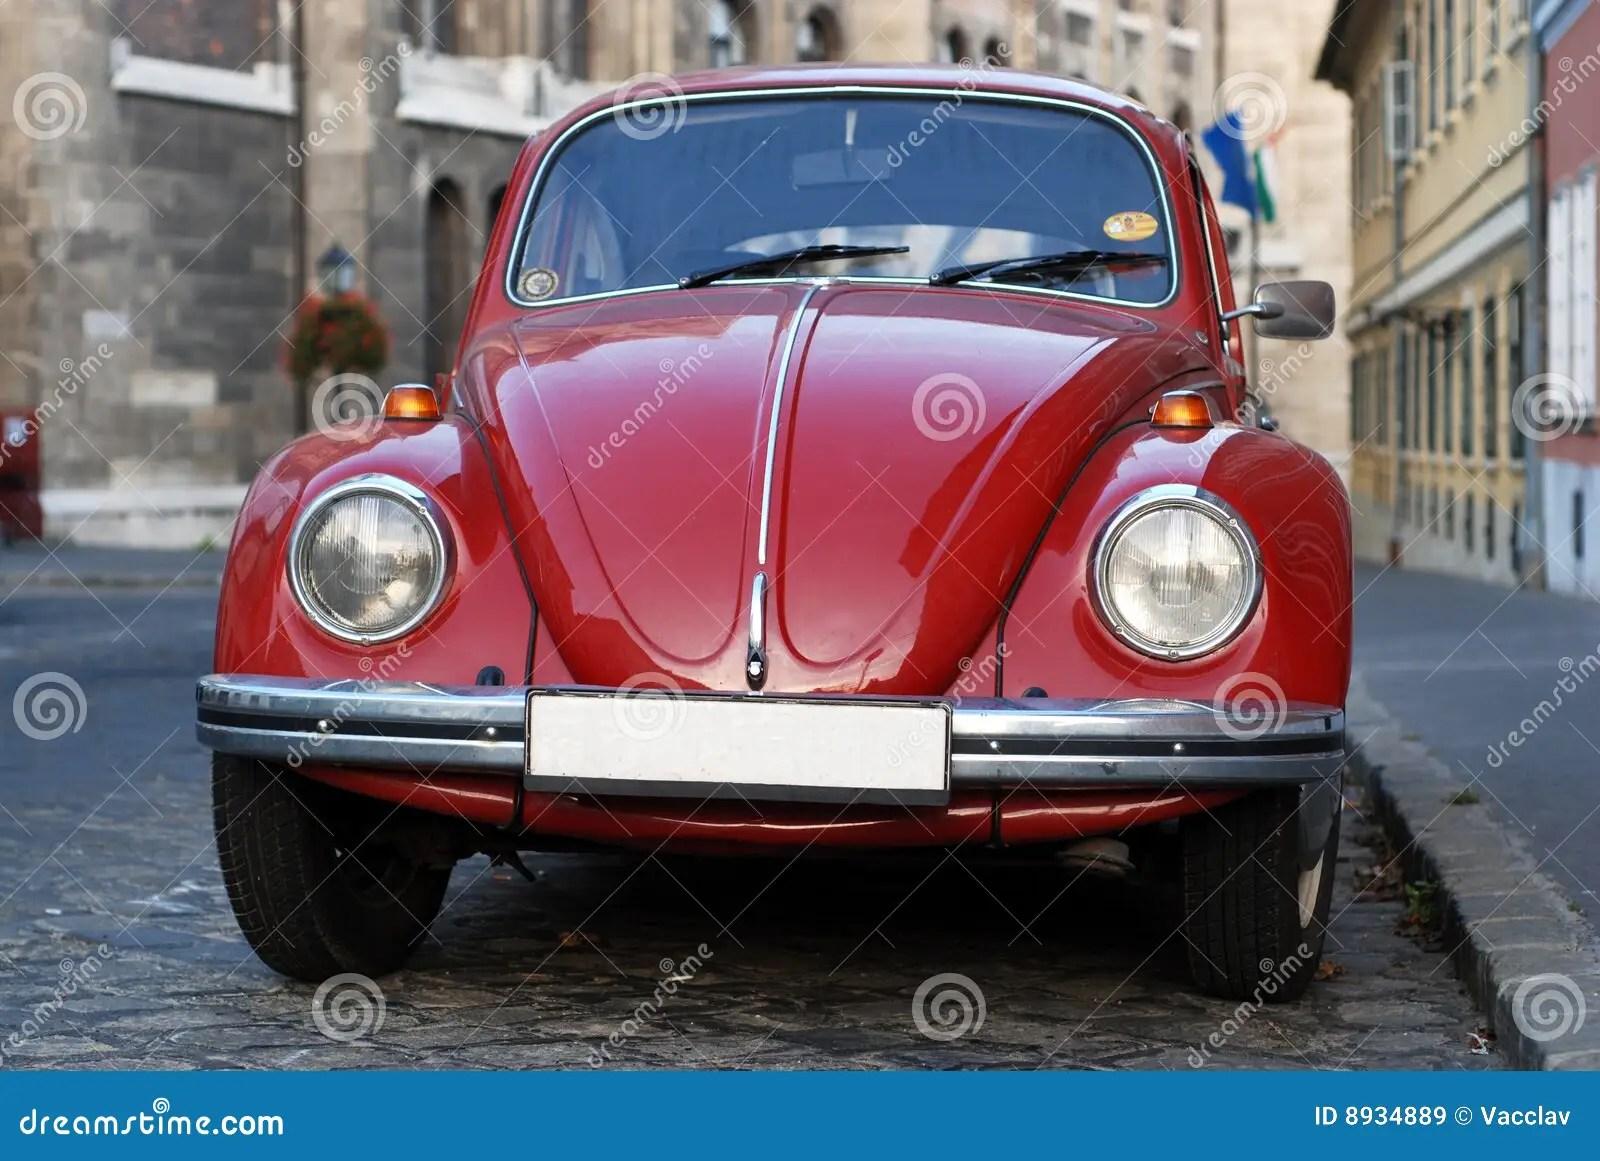 Vw Volkswagen Beetle Old Stock Image Image Of Historic